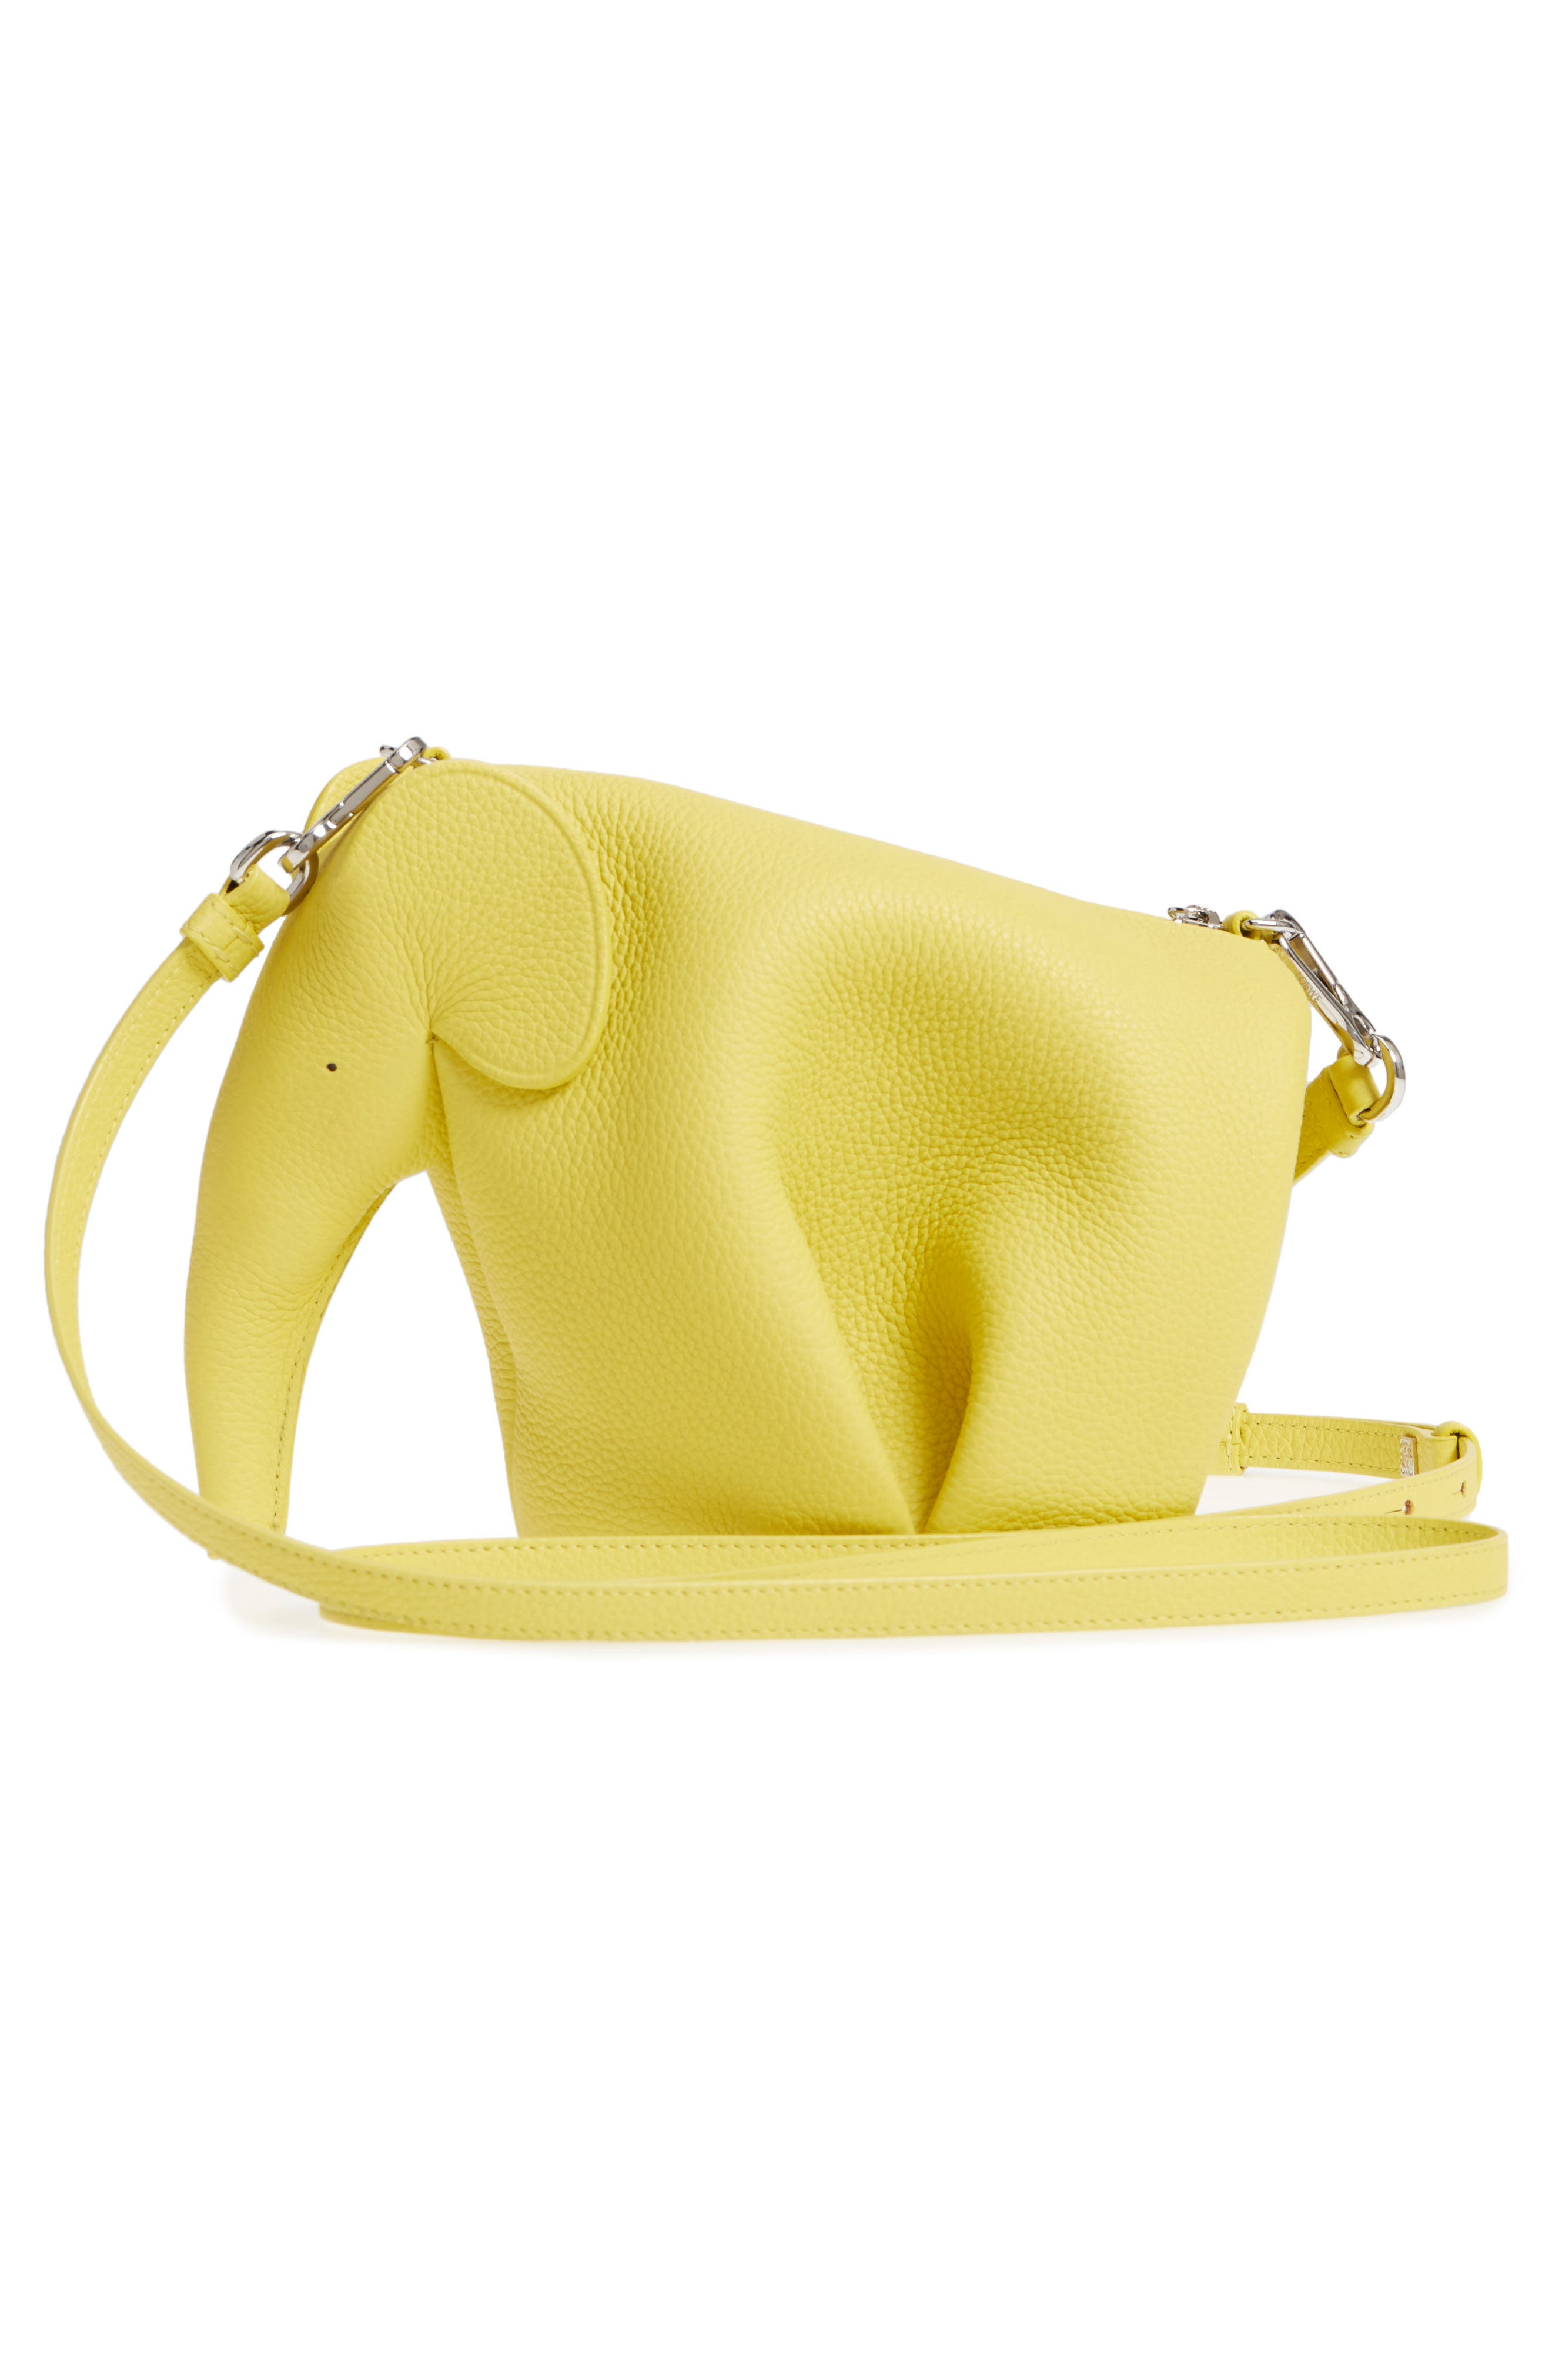 Mini Elephant Calfskin Crossbody Bag,                             Alternate thumbnail 3, color,                             Yellow Lemon